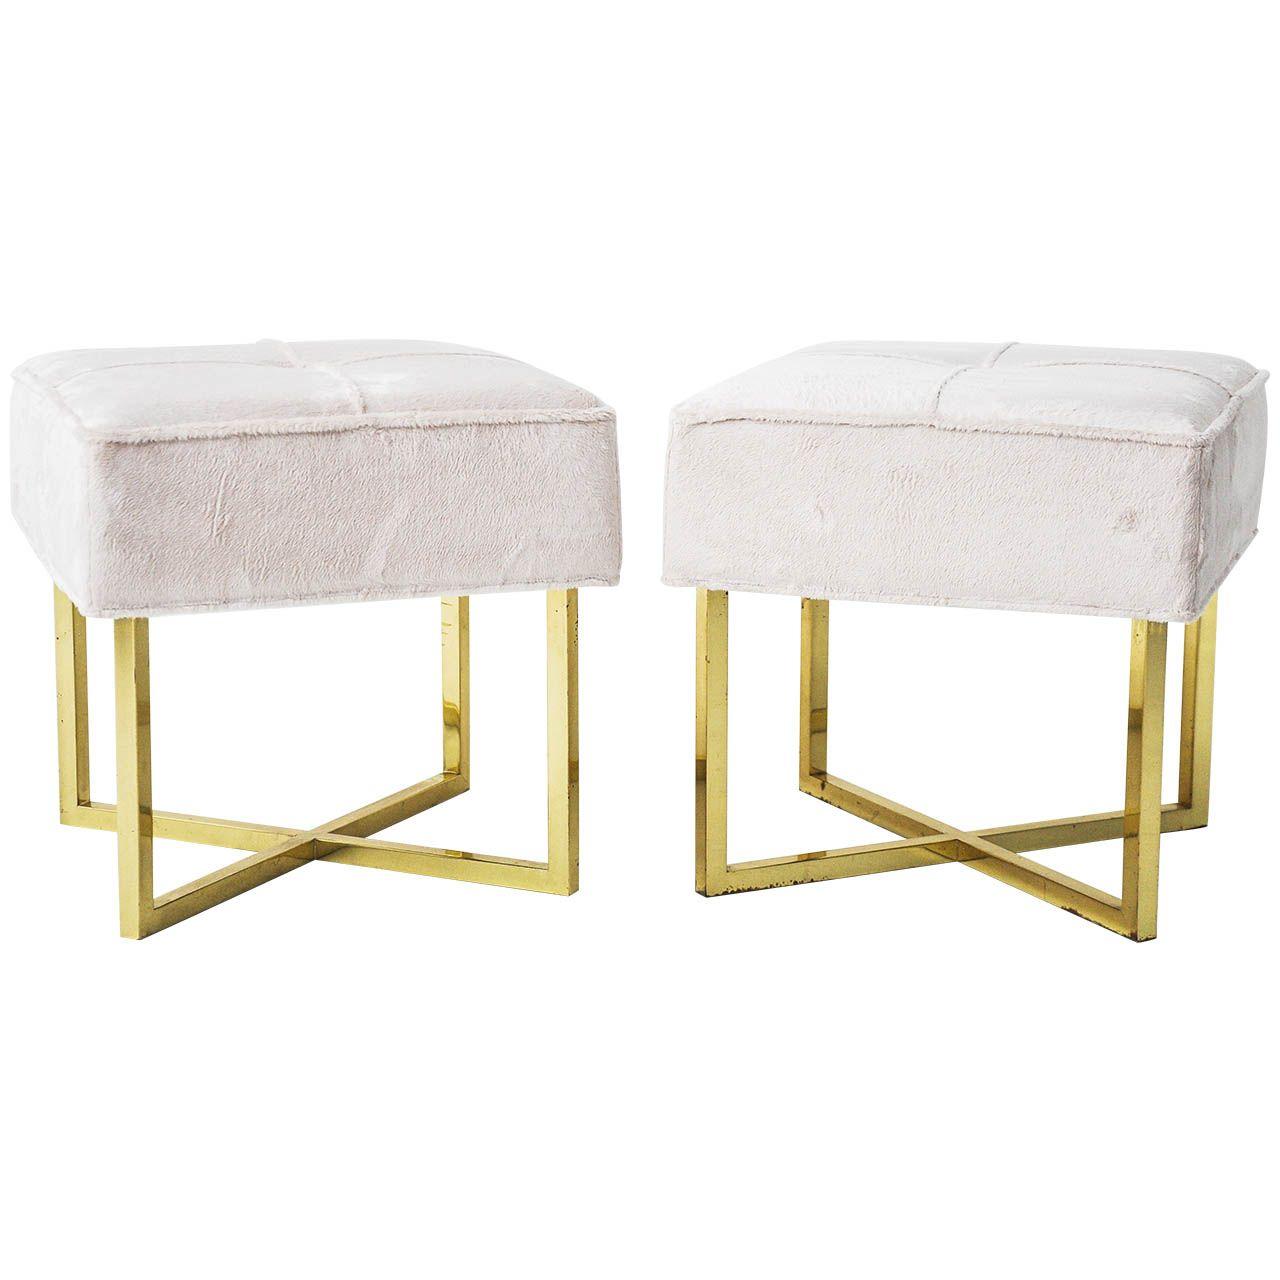 Brass X-Base Stools | Modern stools, Stools and Modern